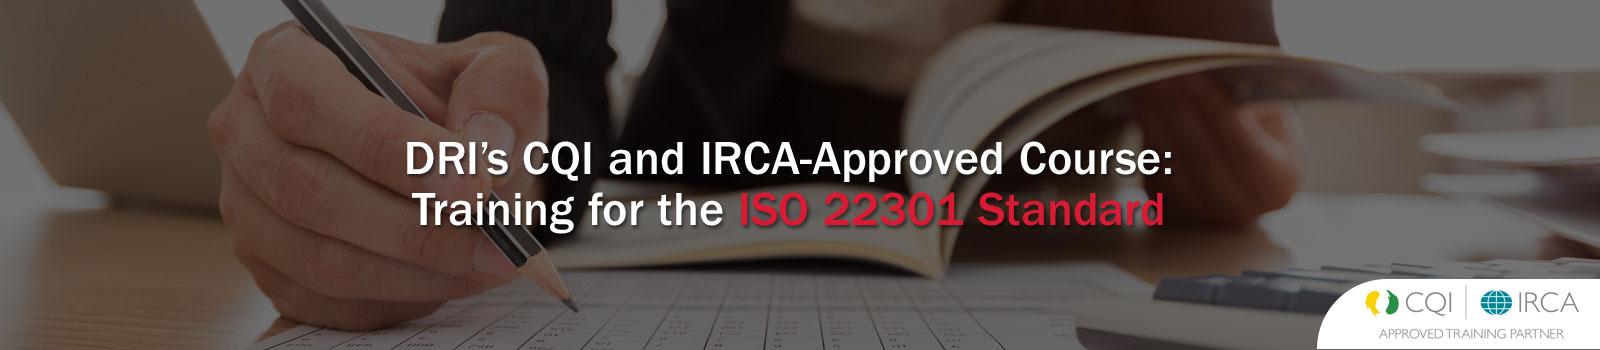 DRI ISO22309 Image